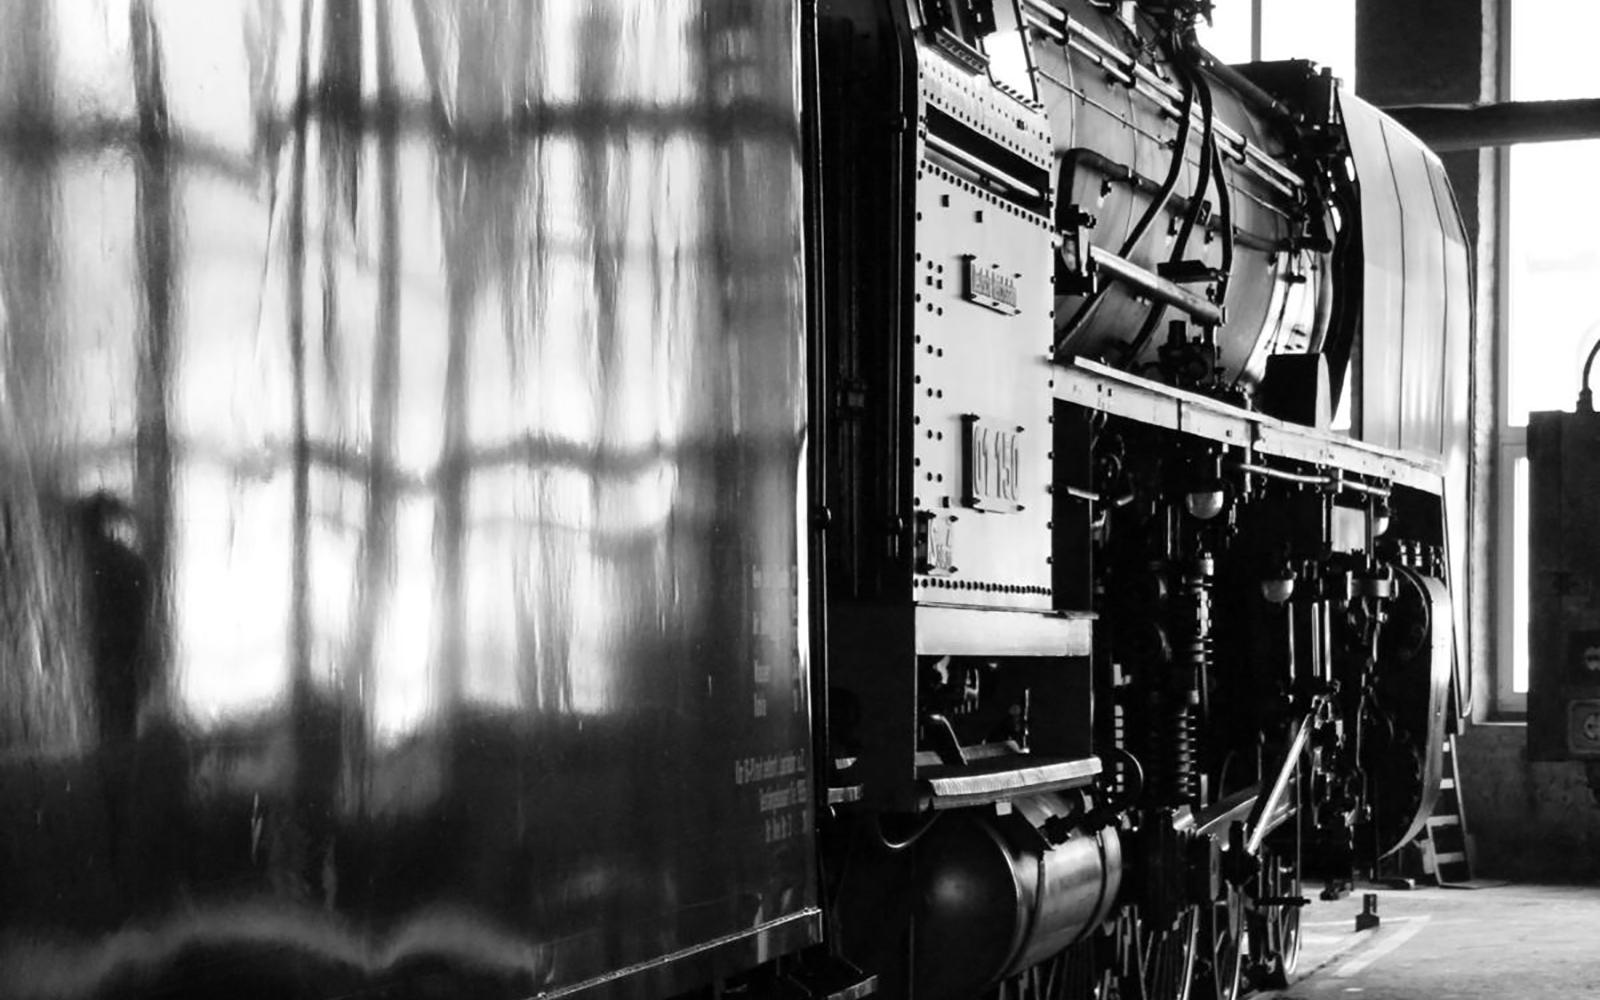 Foto: Christian Wodzinski - Schnellzuglokomotive 01 150